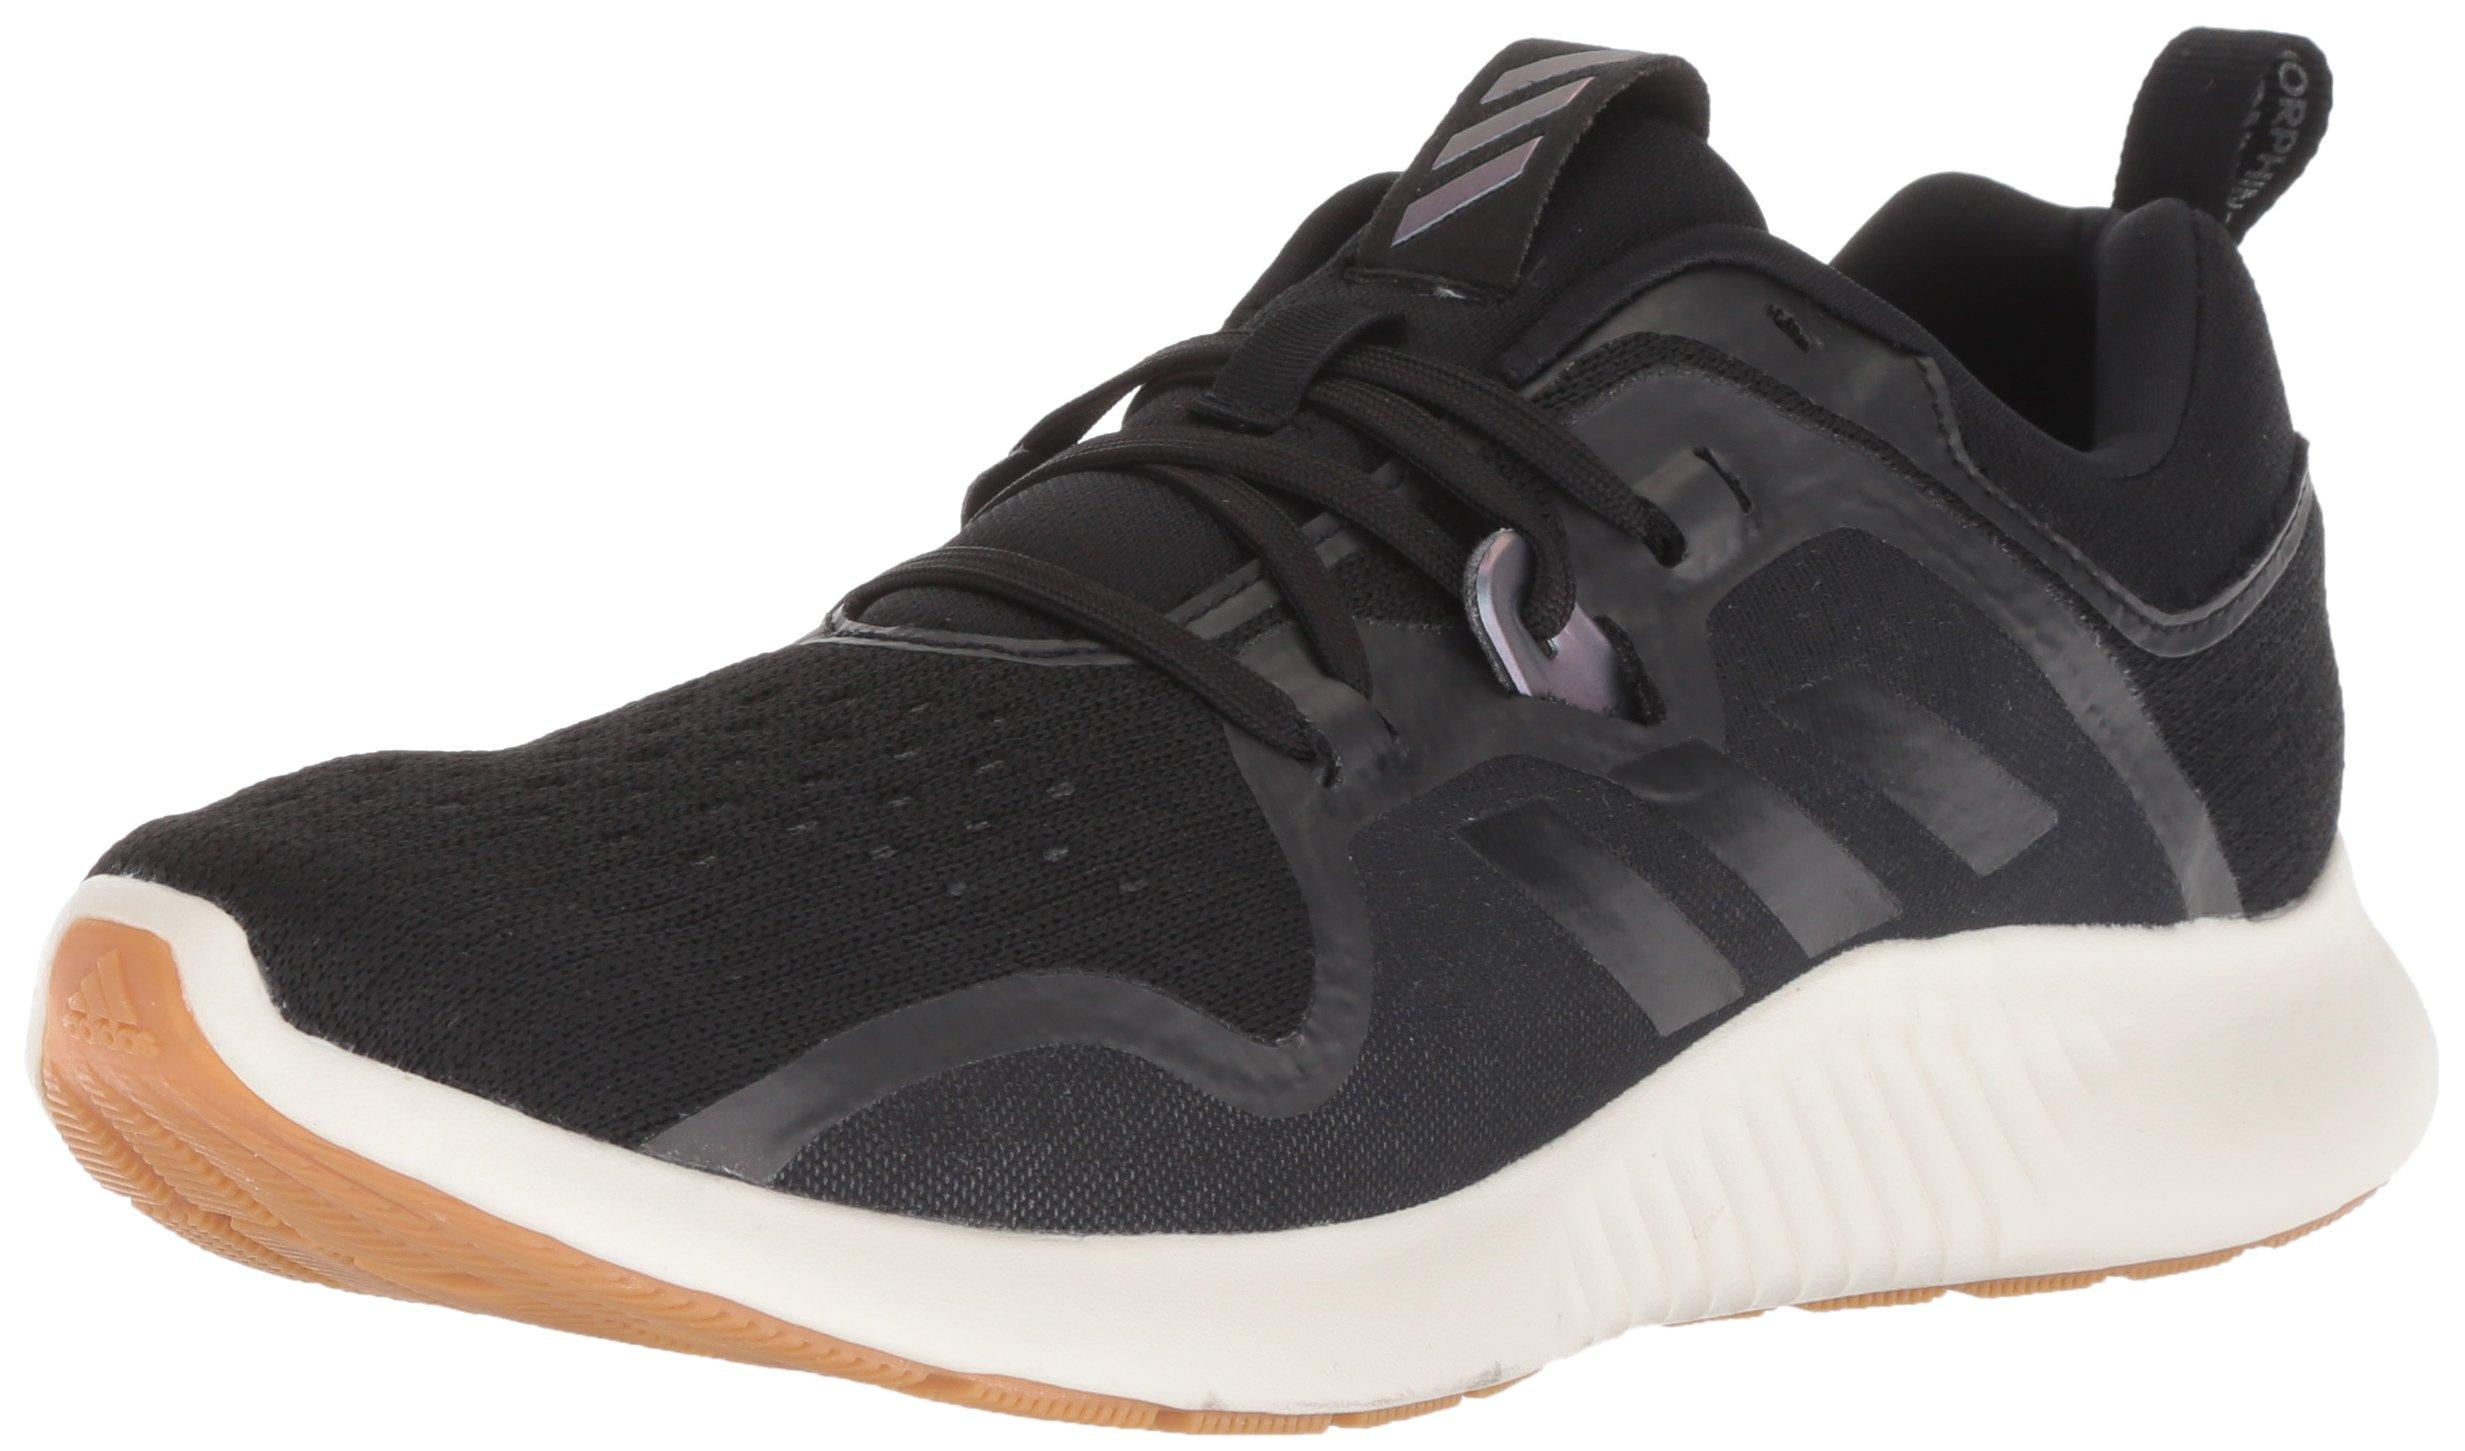 adidas Women's Edgebounce Running Shoe Black/Night Metallic, 5.5 M US by adidas (Image #1)